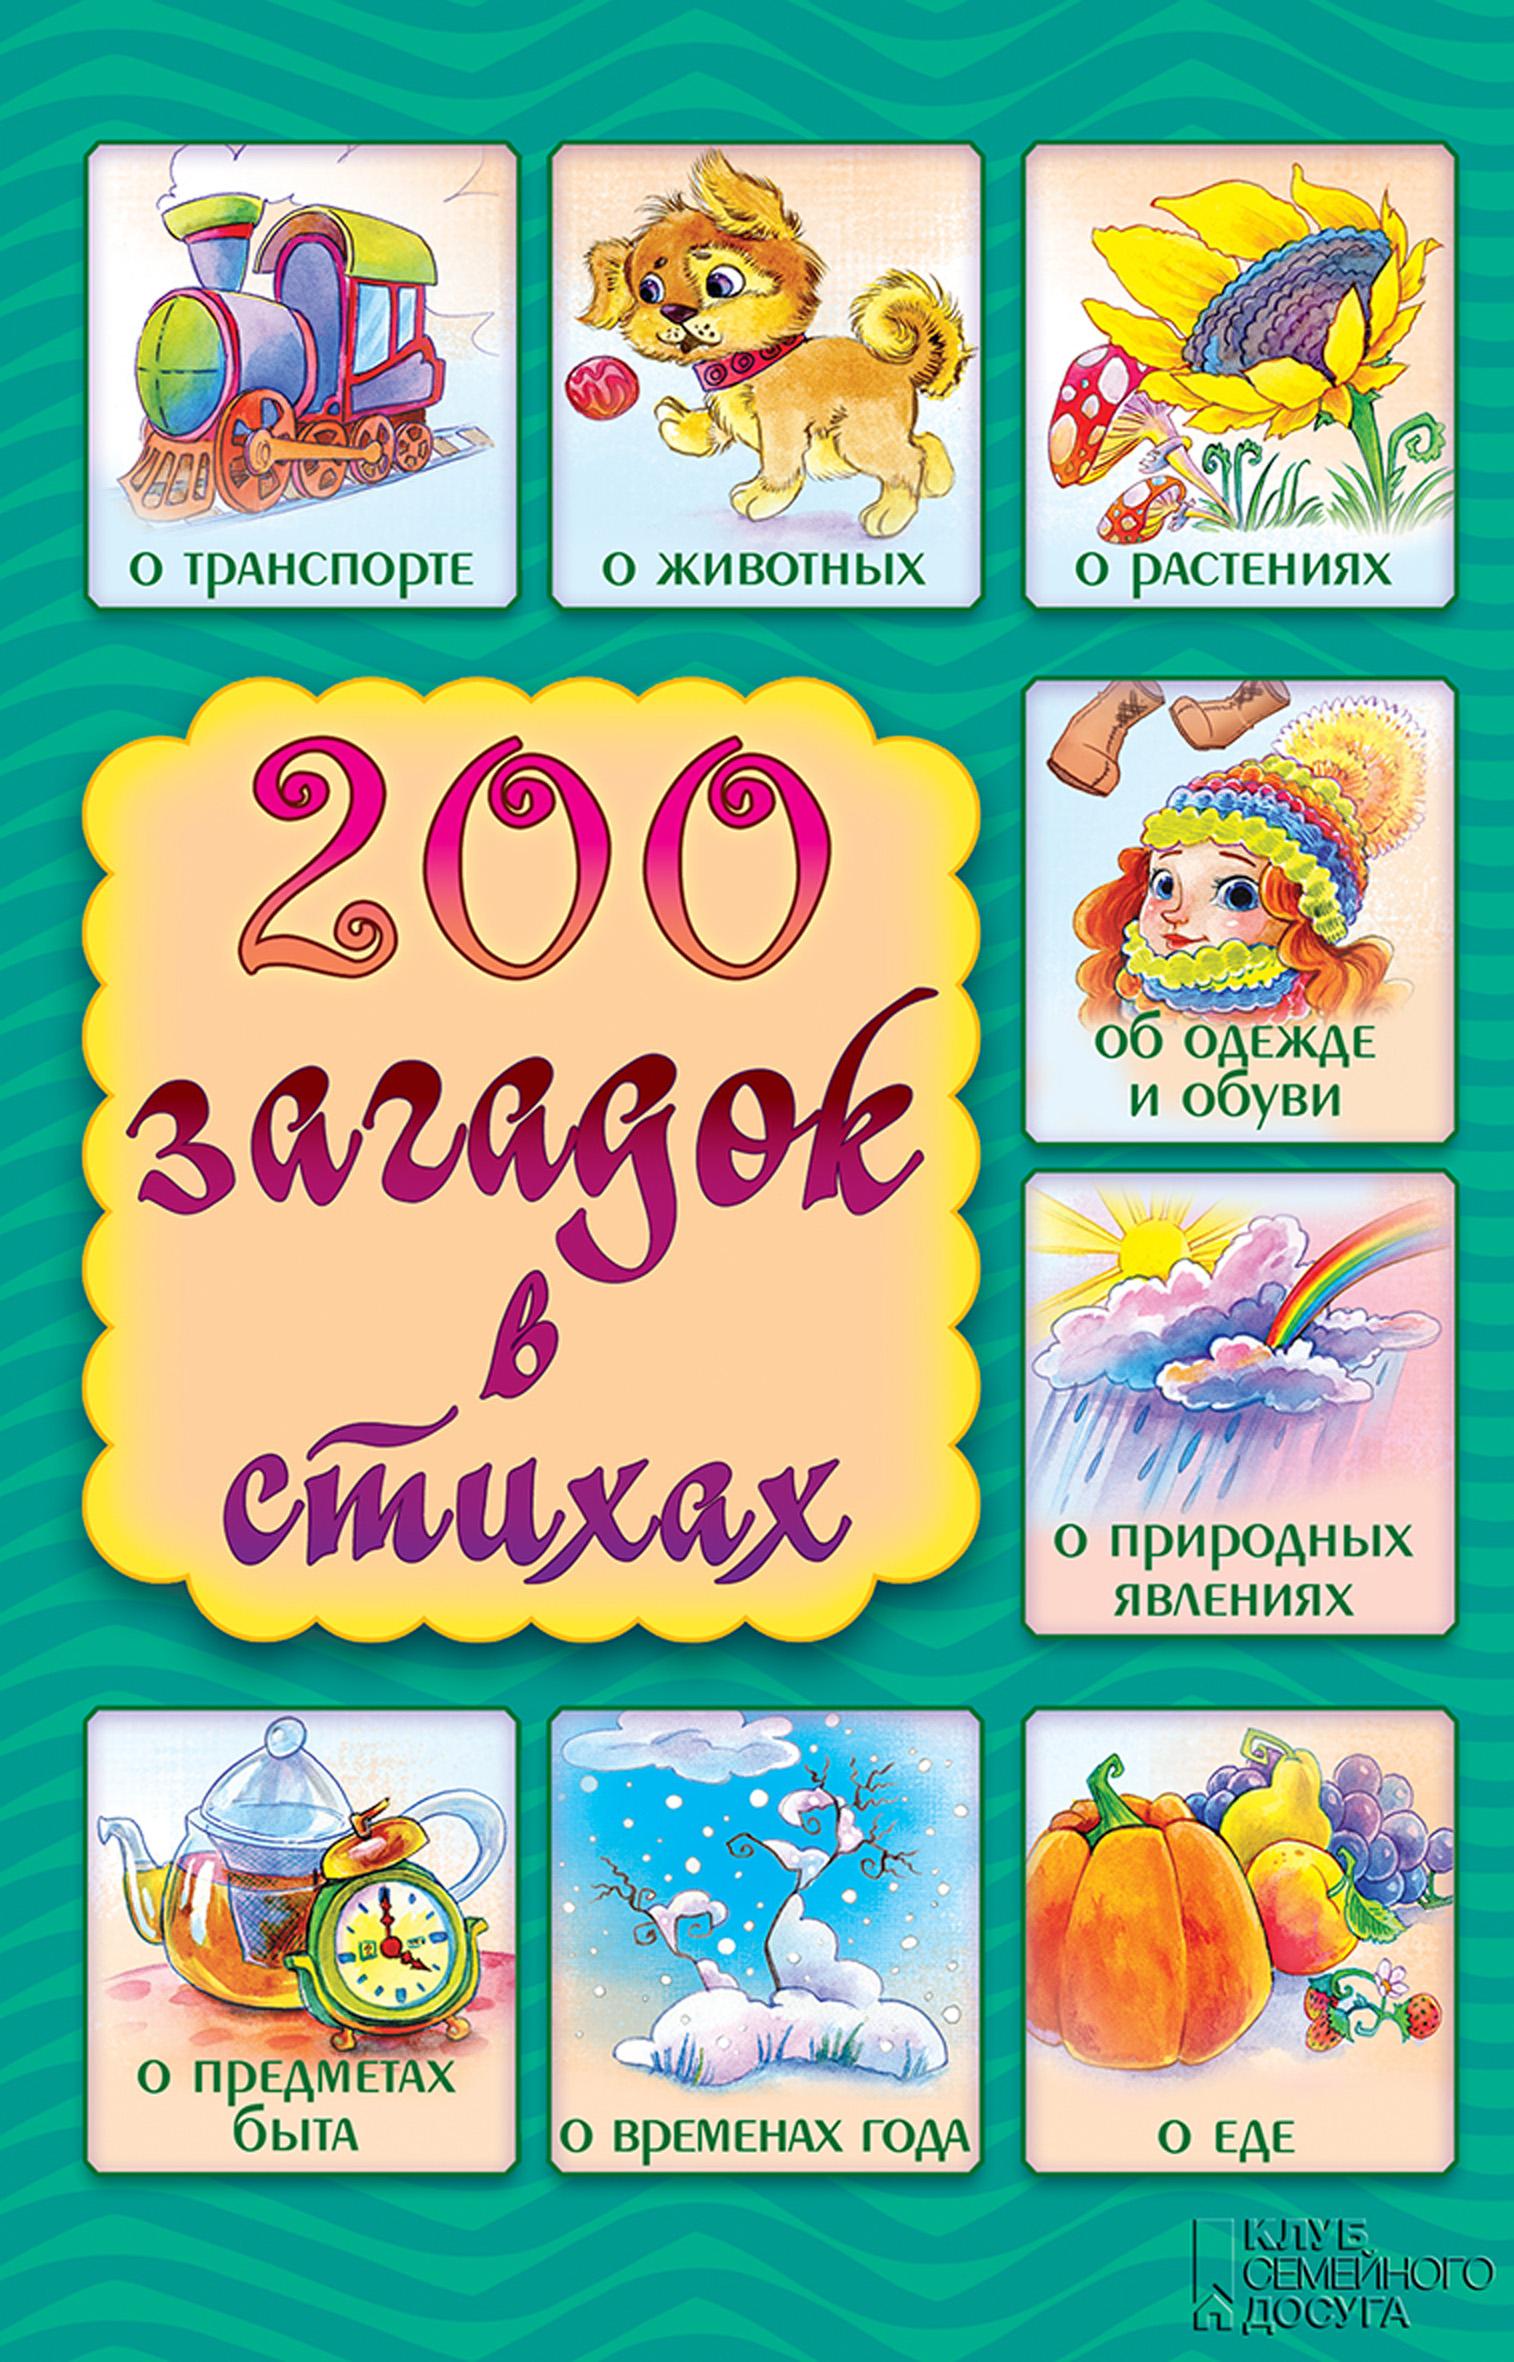 200 загадок в стихах